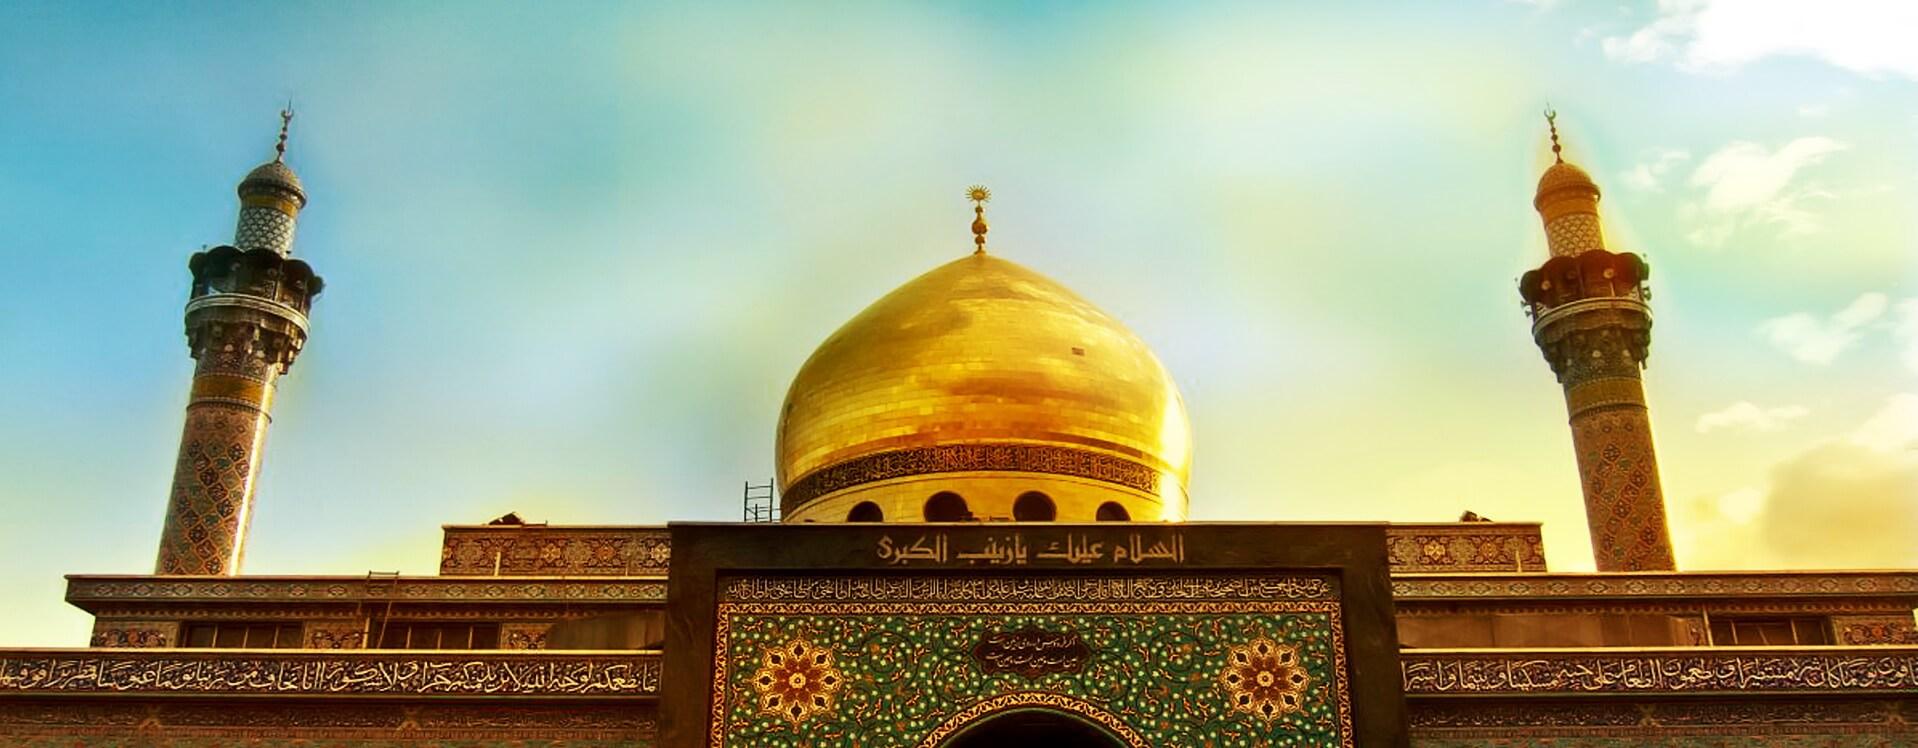 hazrate_zeynab_sa_Full_HDwallpaper (1)